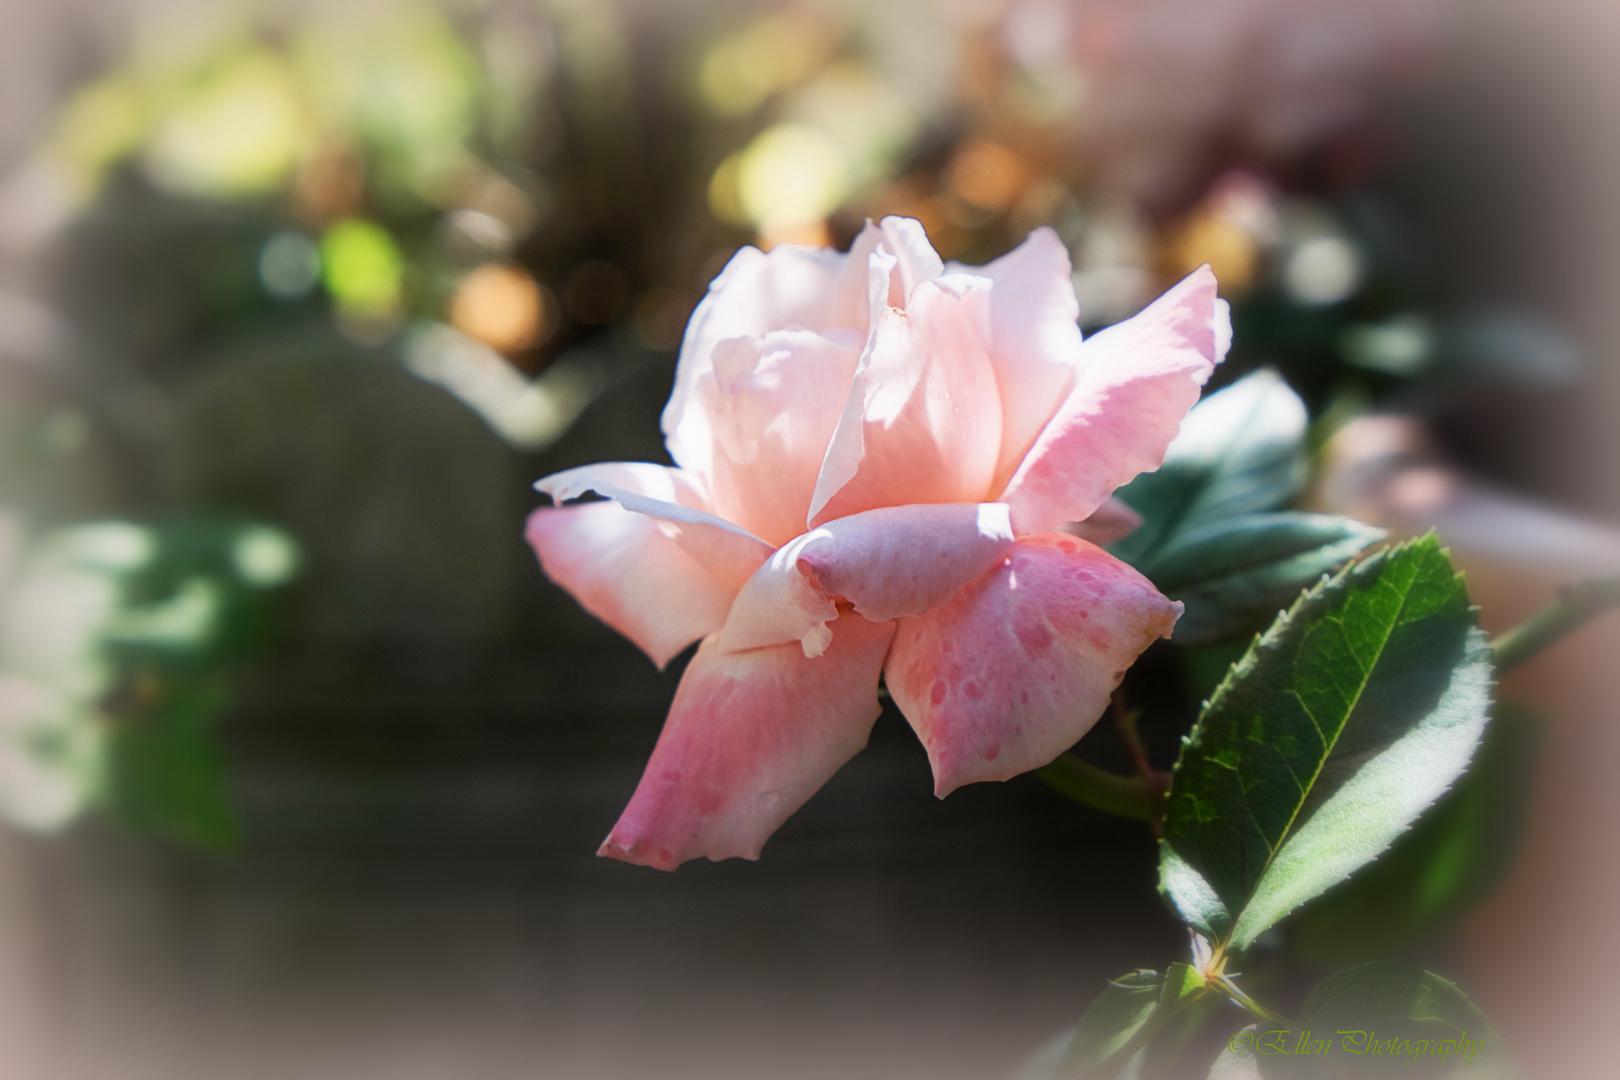 one of my beloved roses